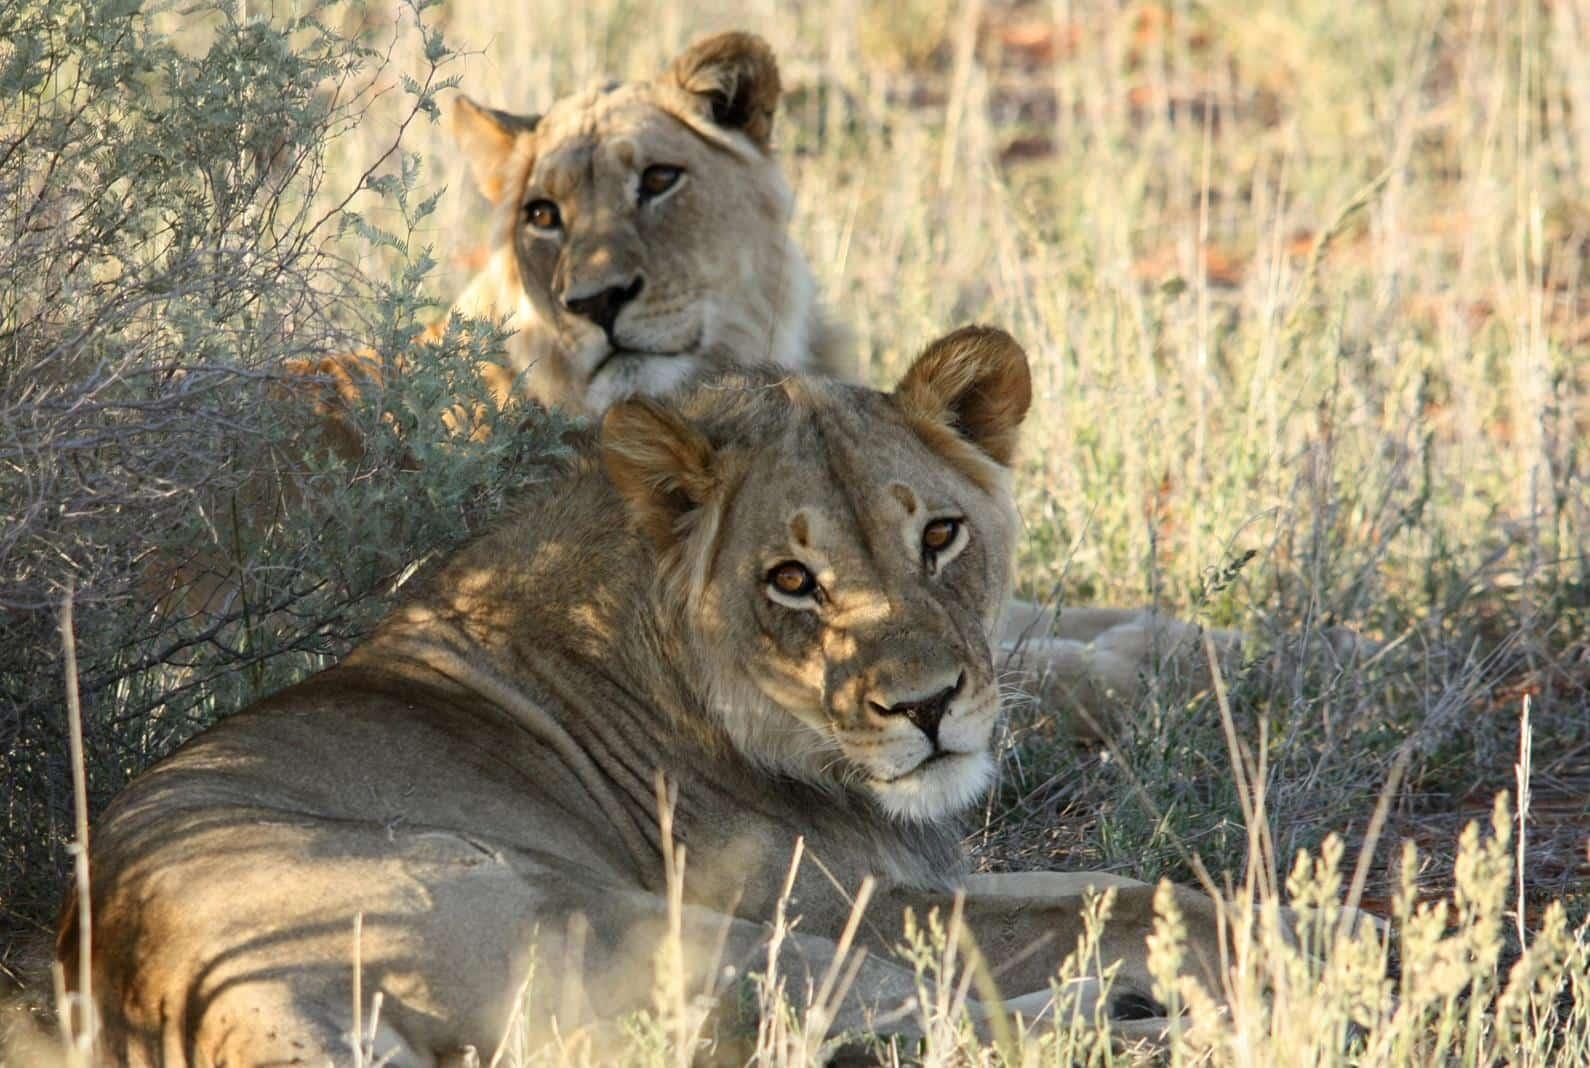 How To Act Around Wild Animals While On Safari